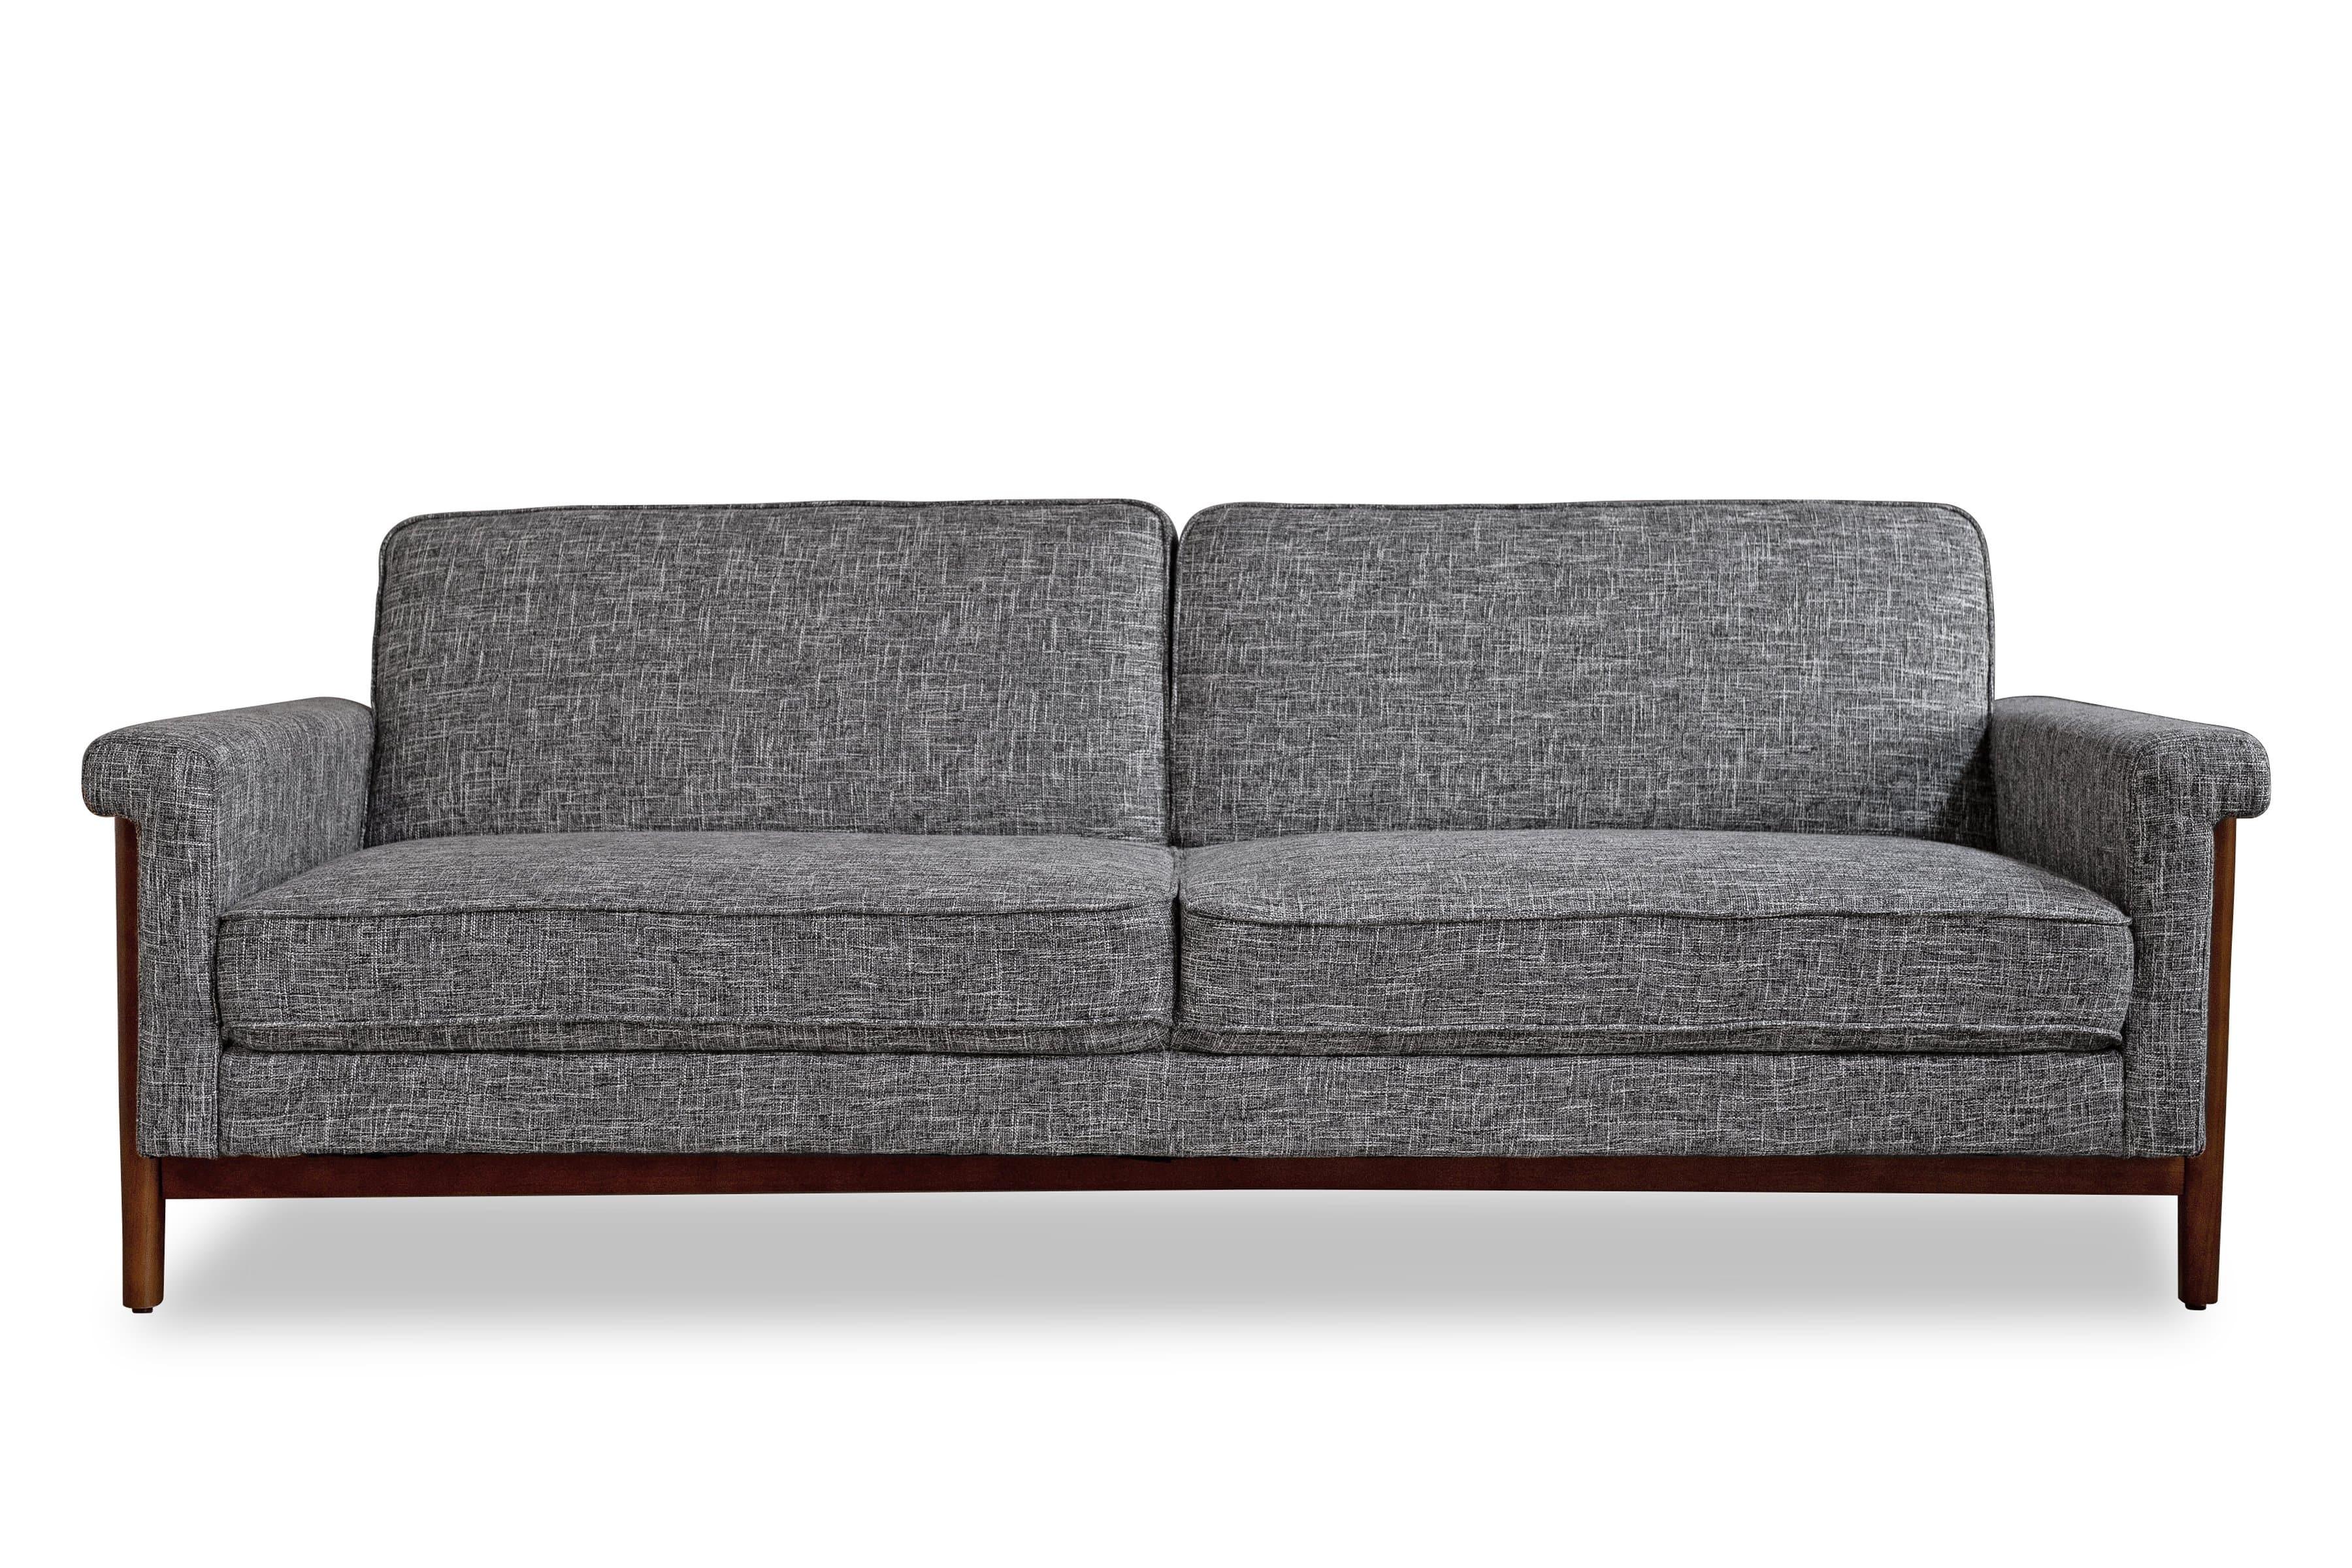 Ashbury Mid Century Modern Futon Sofa Bed Sleeper Sofa Edloe Finch Furniture Co